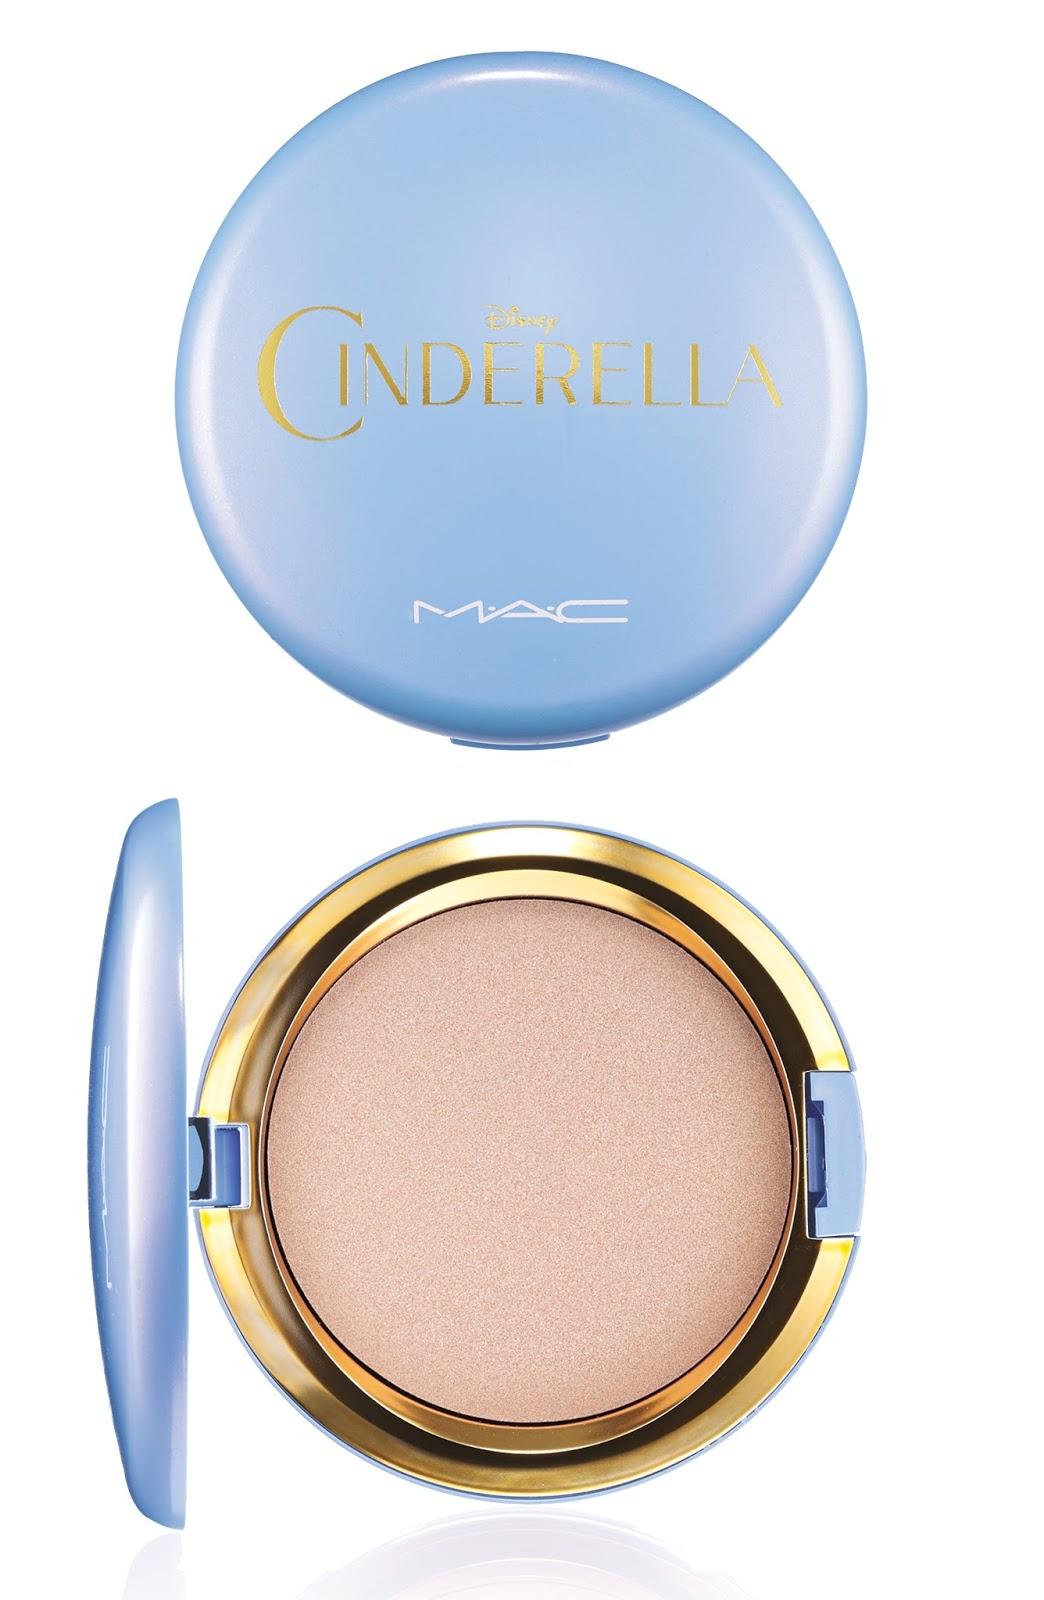 Press Release: MAC Cinderella - March 16th 2015